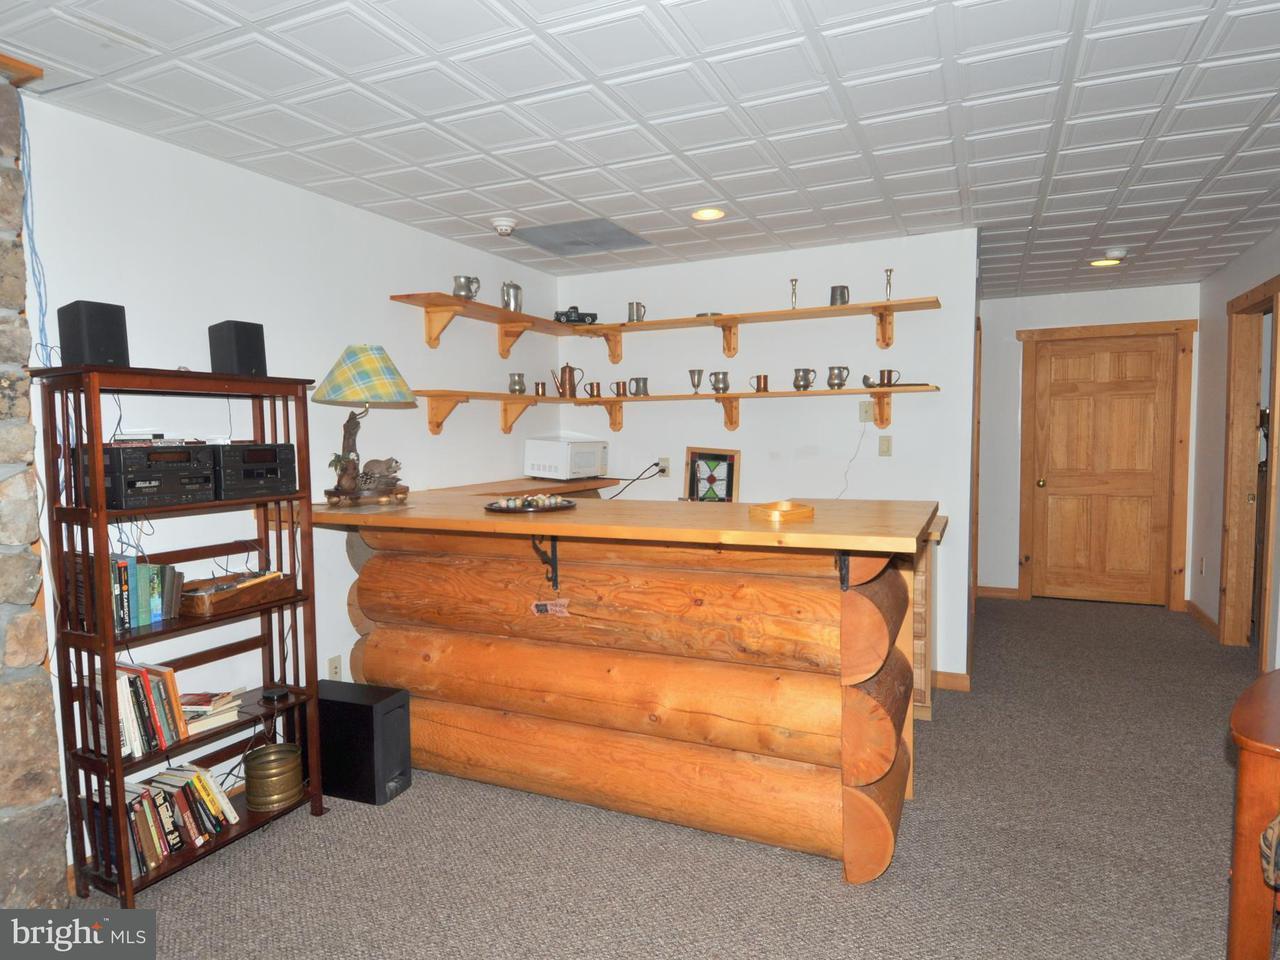 Additional photo for property listing at 207 BREAKAGE WAY 207 BREAKAGE WAY Berkeley Springs, West Virginia 25411 Estados Unidos